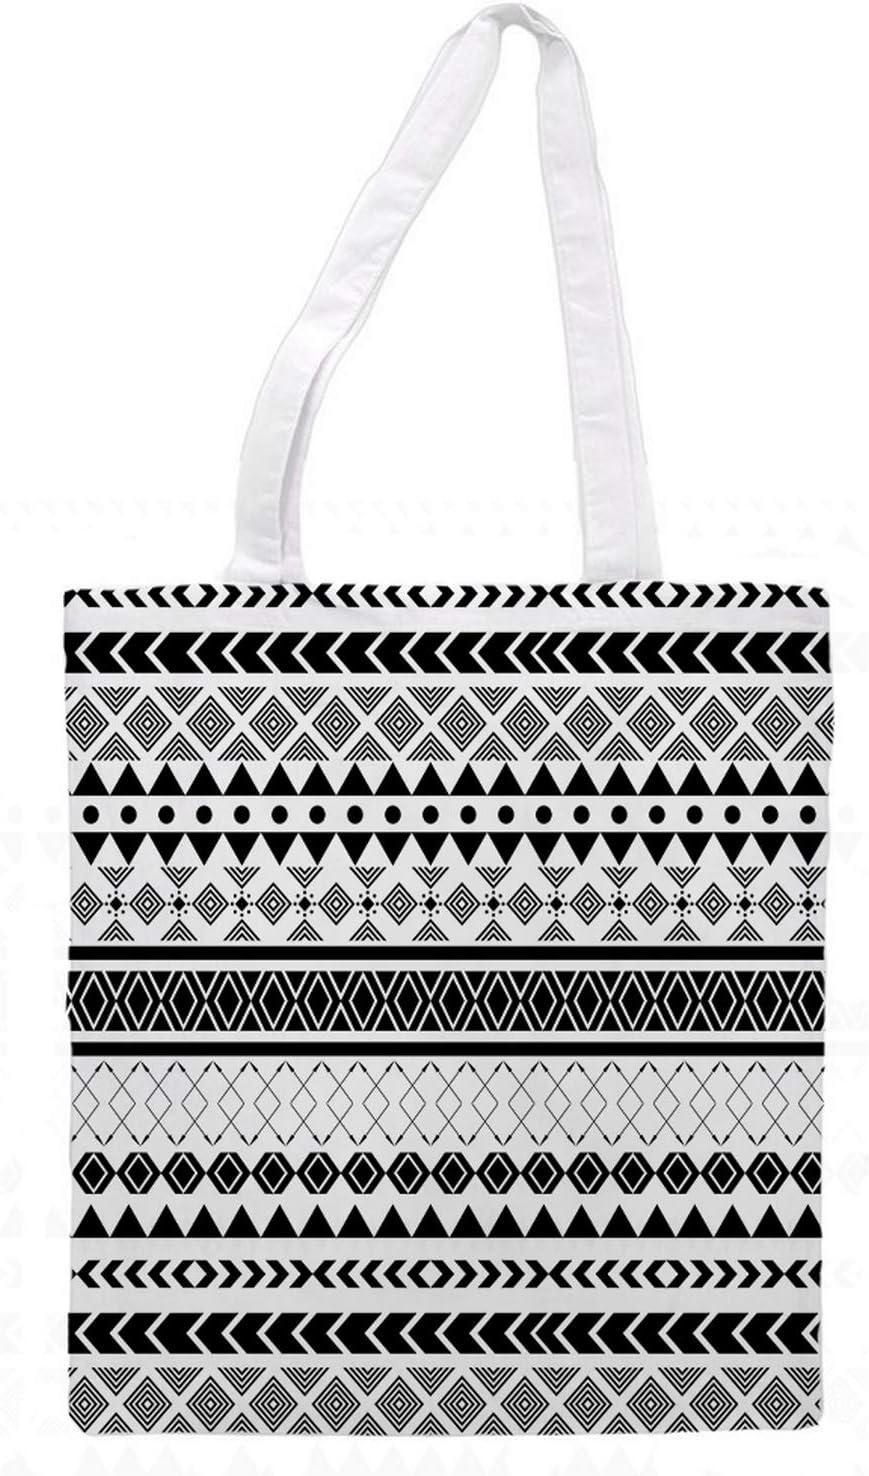 Womens Tote Bag - Black & White - Sports Gym Lunch Yoga Shopping Travel Bag Washable - 1.47X0.98 Ft